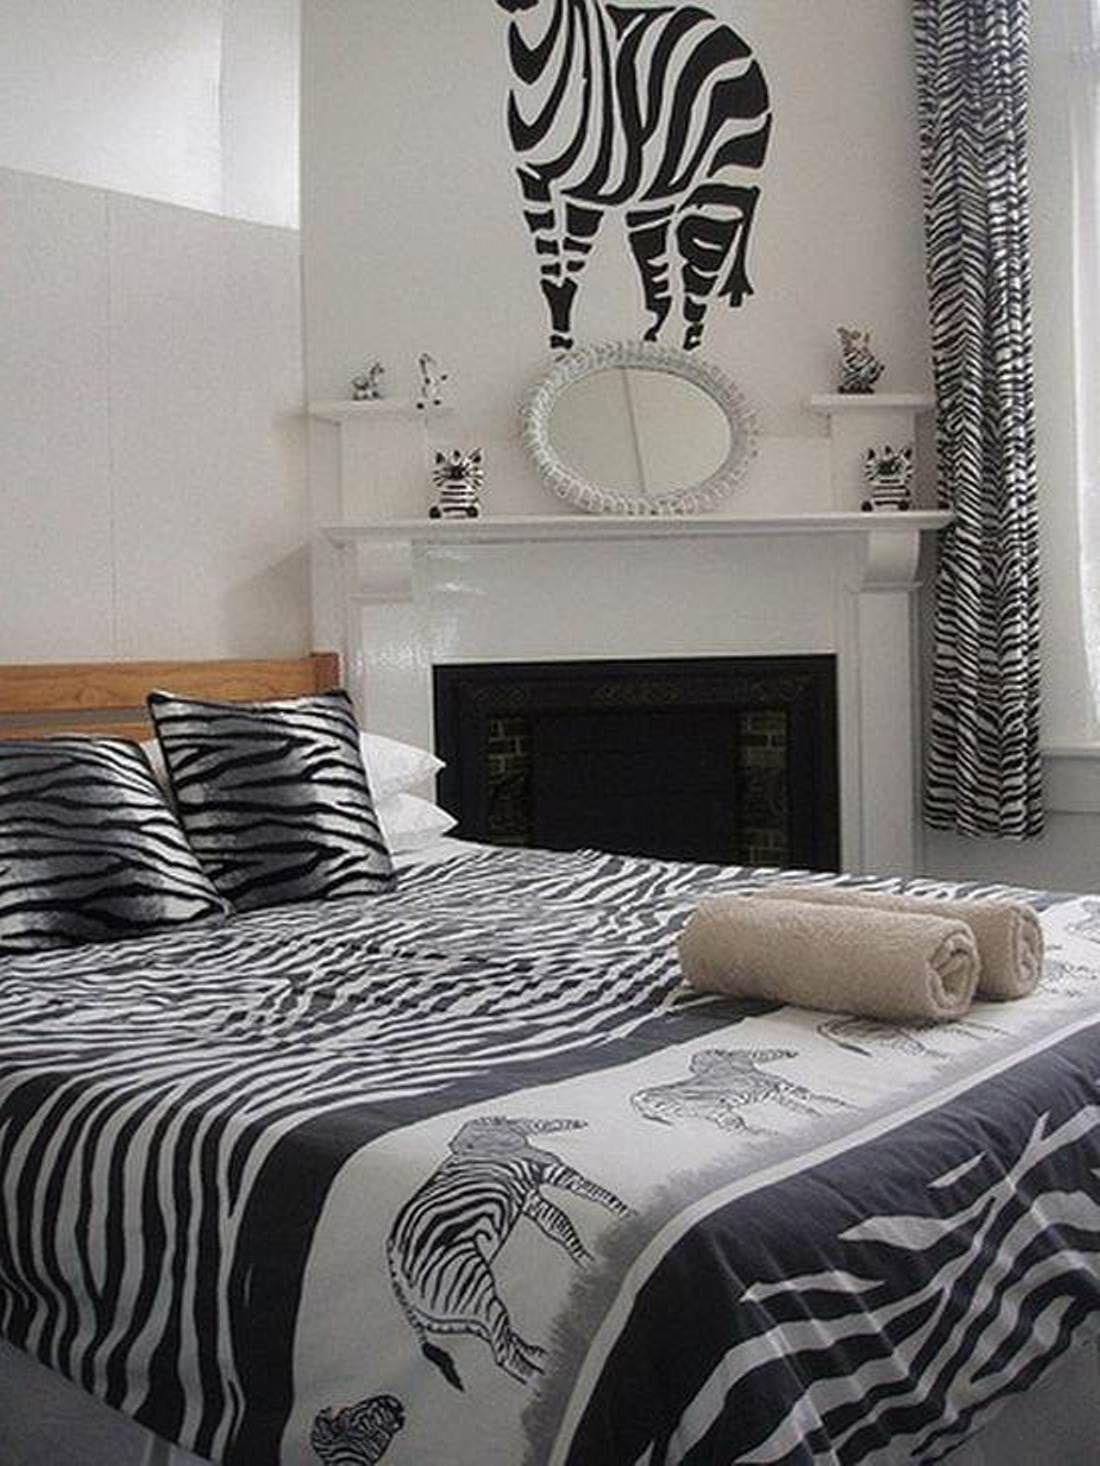 Zebra Print Bedroom Ideas Decoration Interior And Exterior House ...